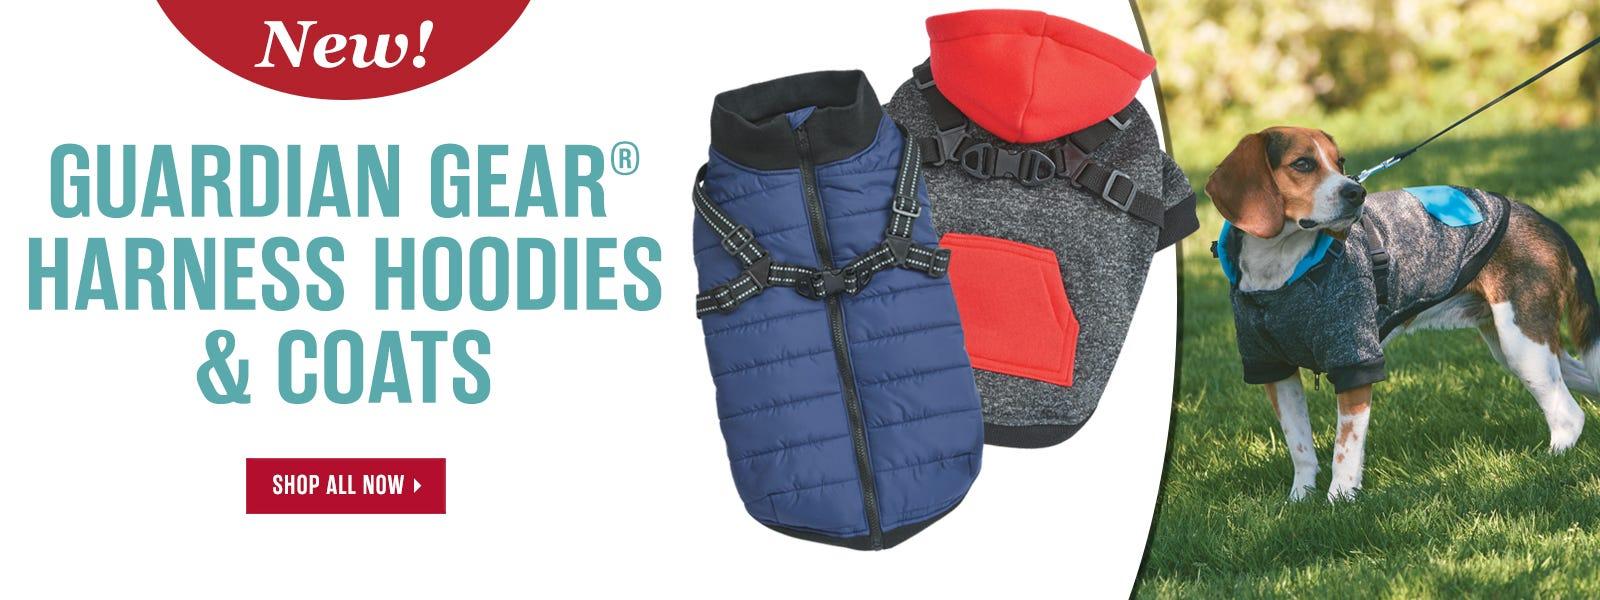 Harness Coats and Hoodies